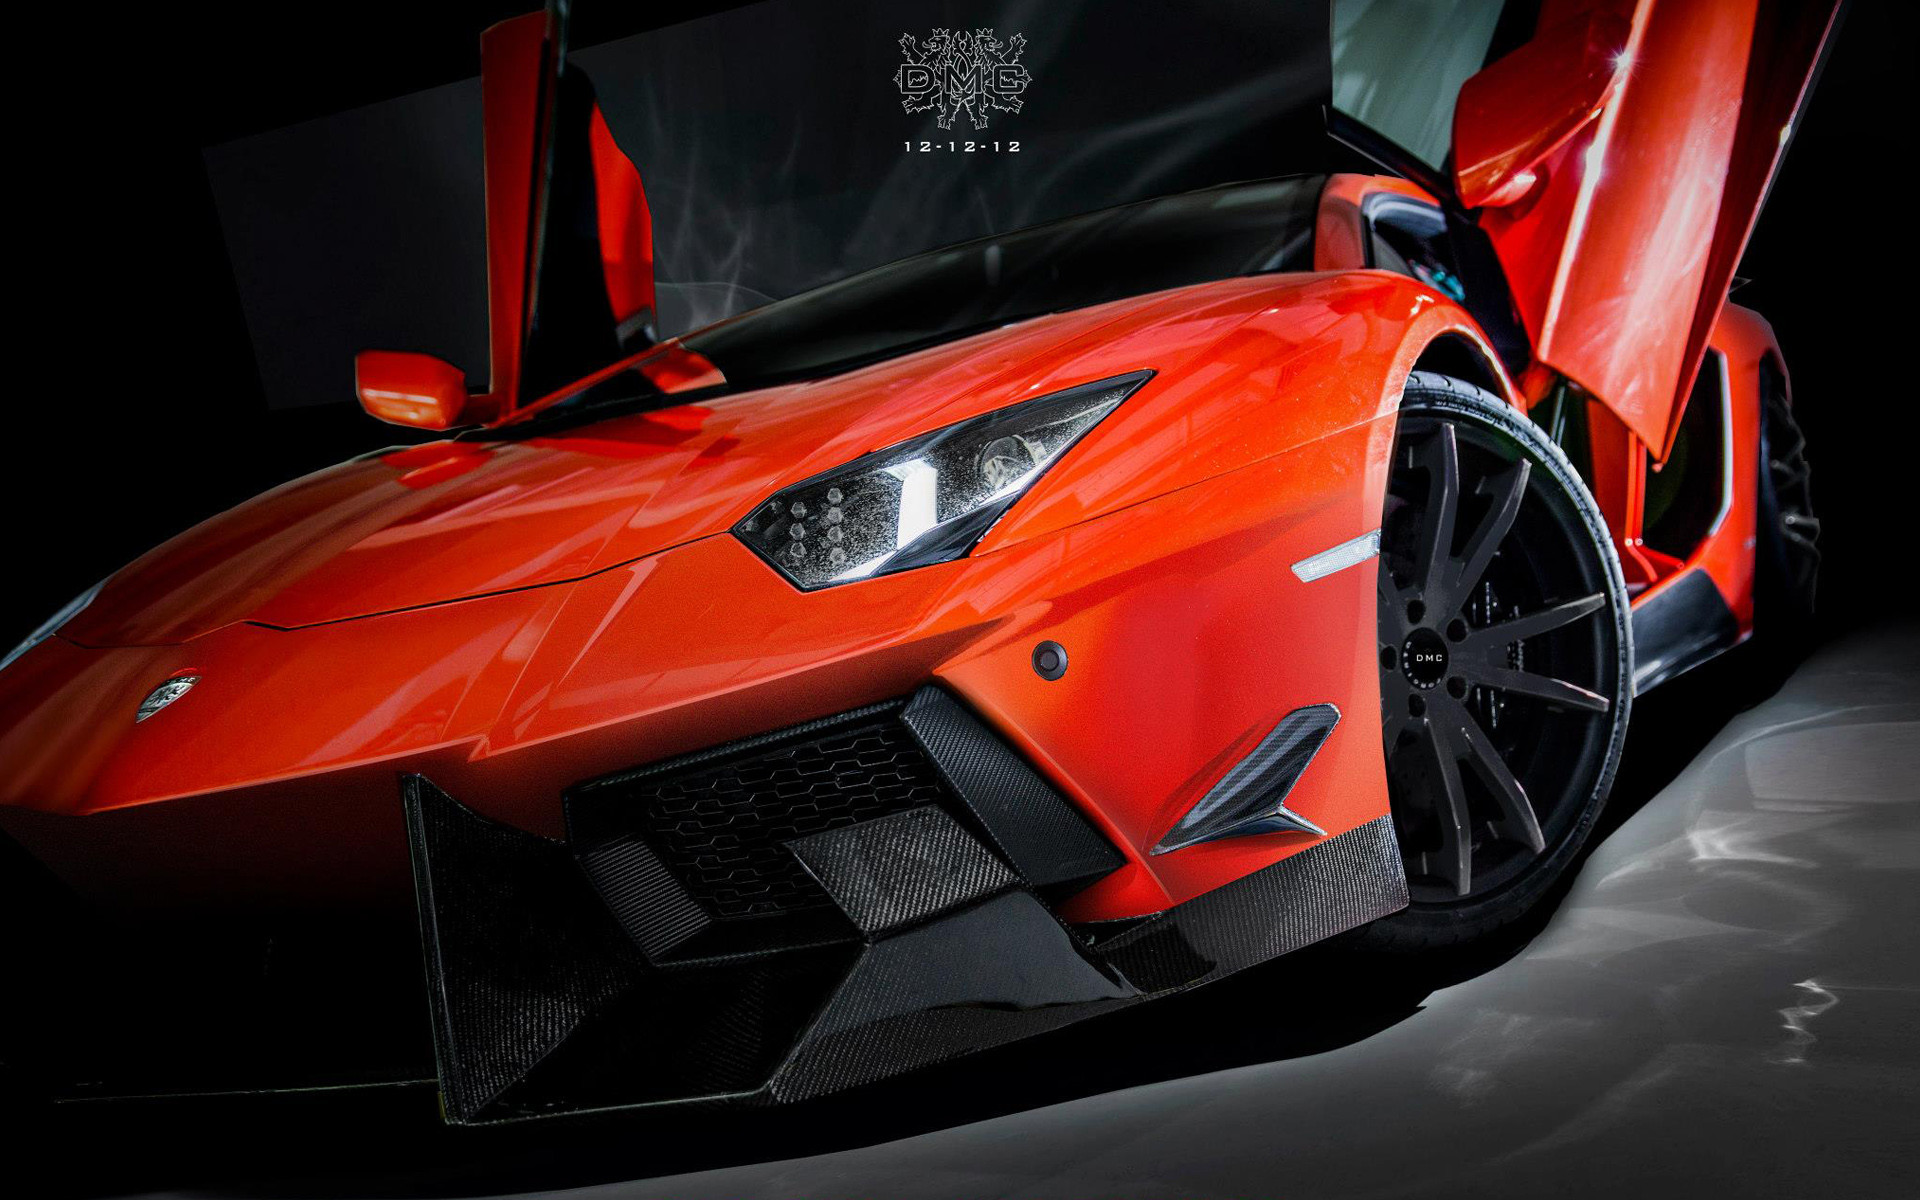 DMC Tuning Lamborghini Aventador Wallpapers | HD Wallpapers